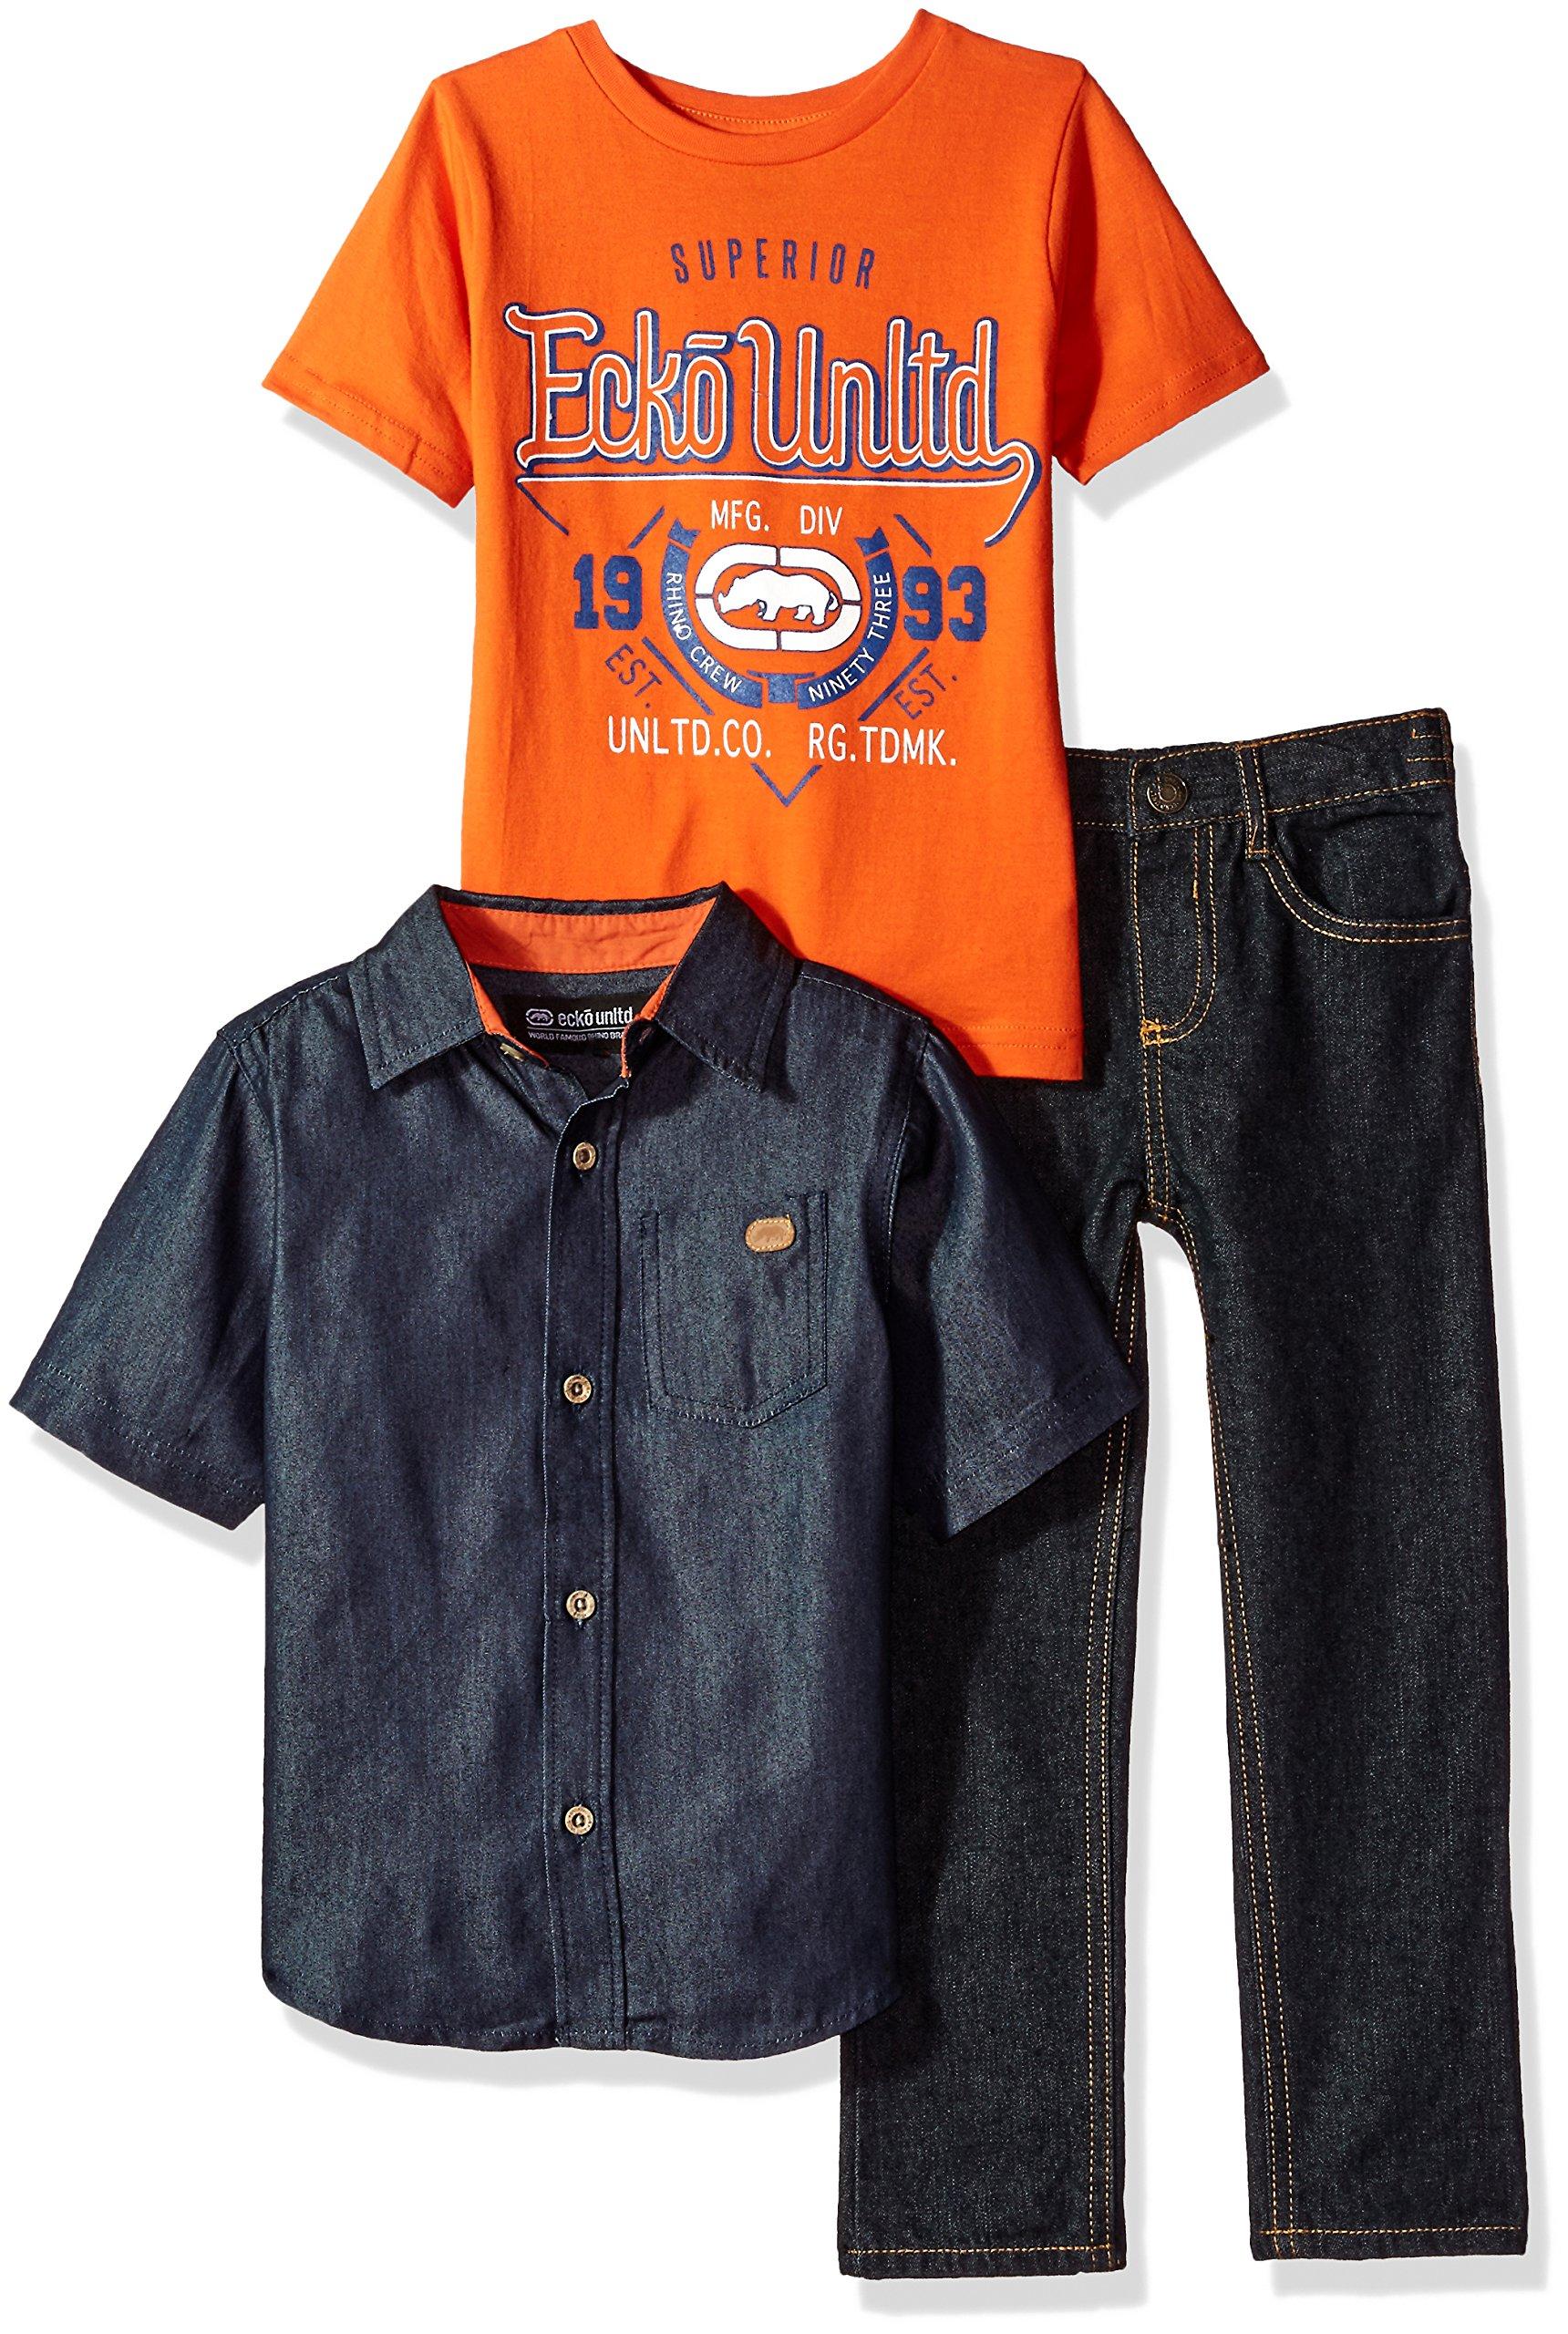 Ecko Unltd. Little Boys' Short Sleeve Shirt, T-Shirt and Pant Set (More Styles), SN91-Multicolor Plaid, 5